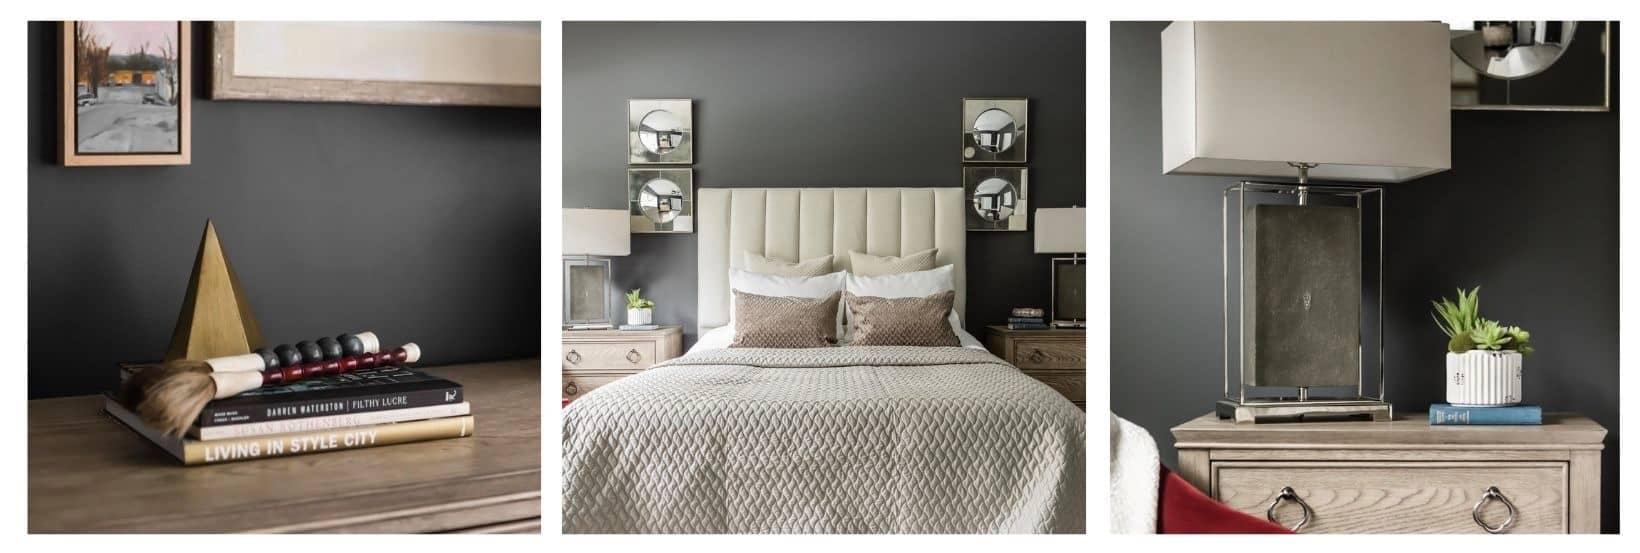 interior designer durham raleigh chaple hill cary nc lk design